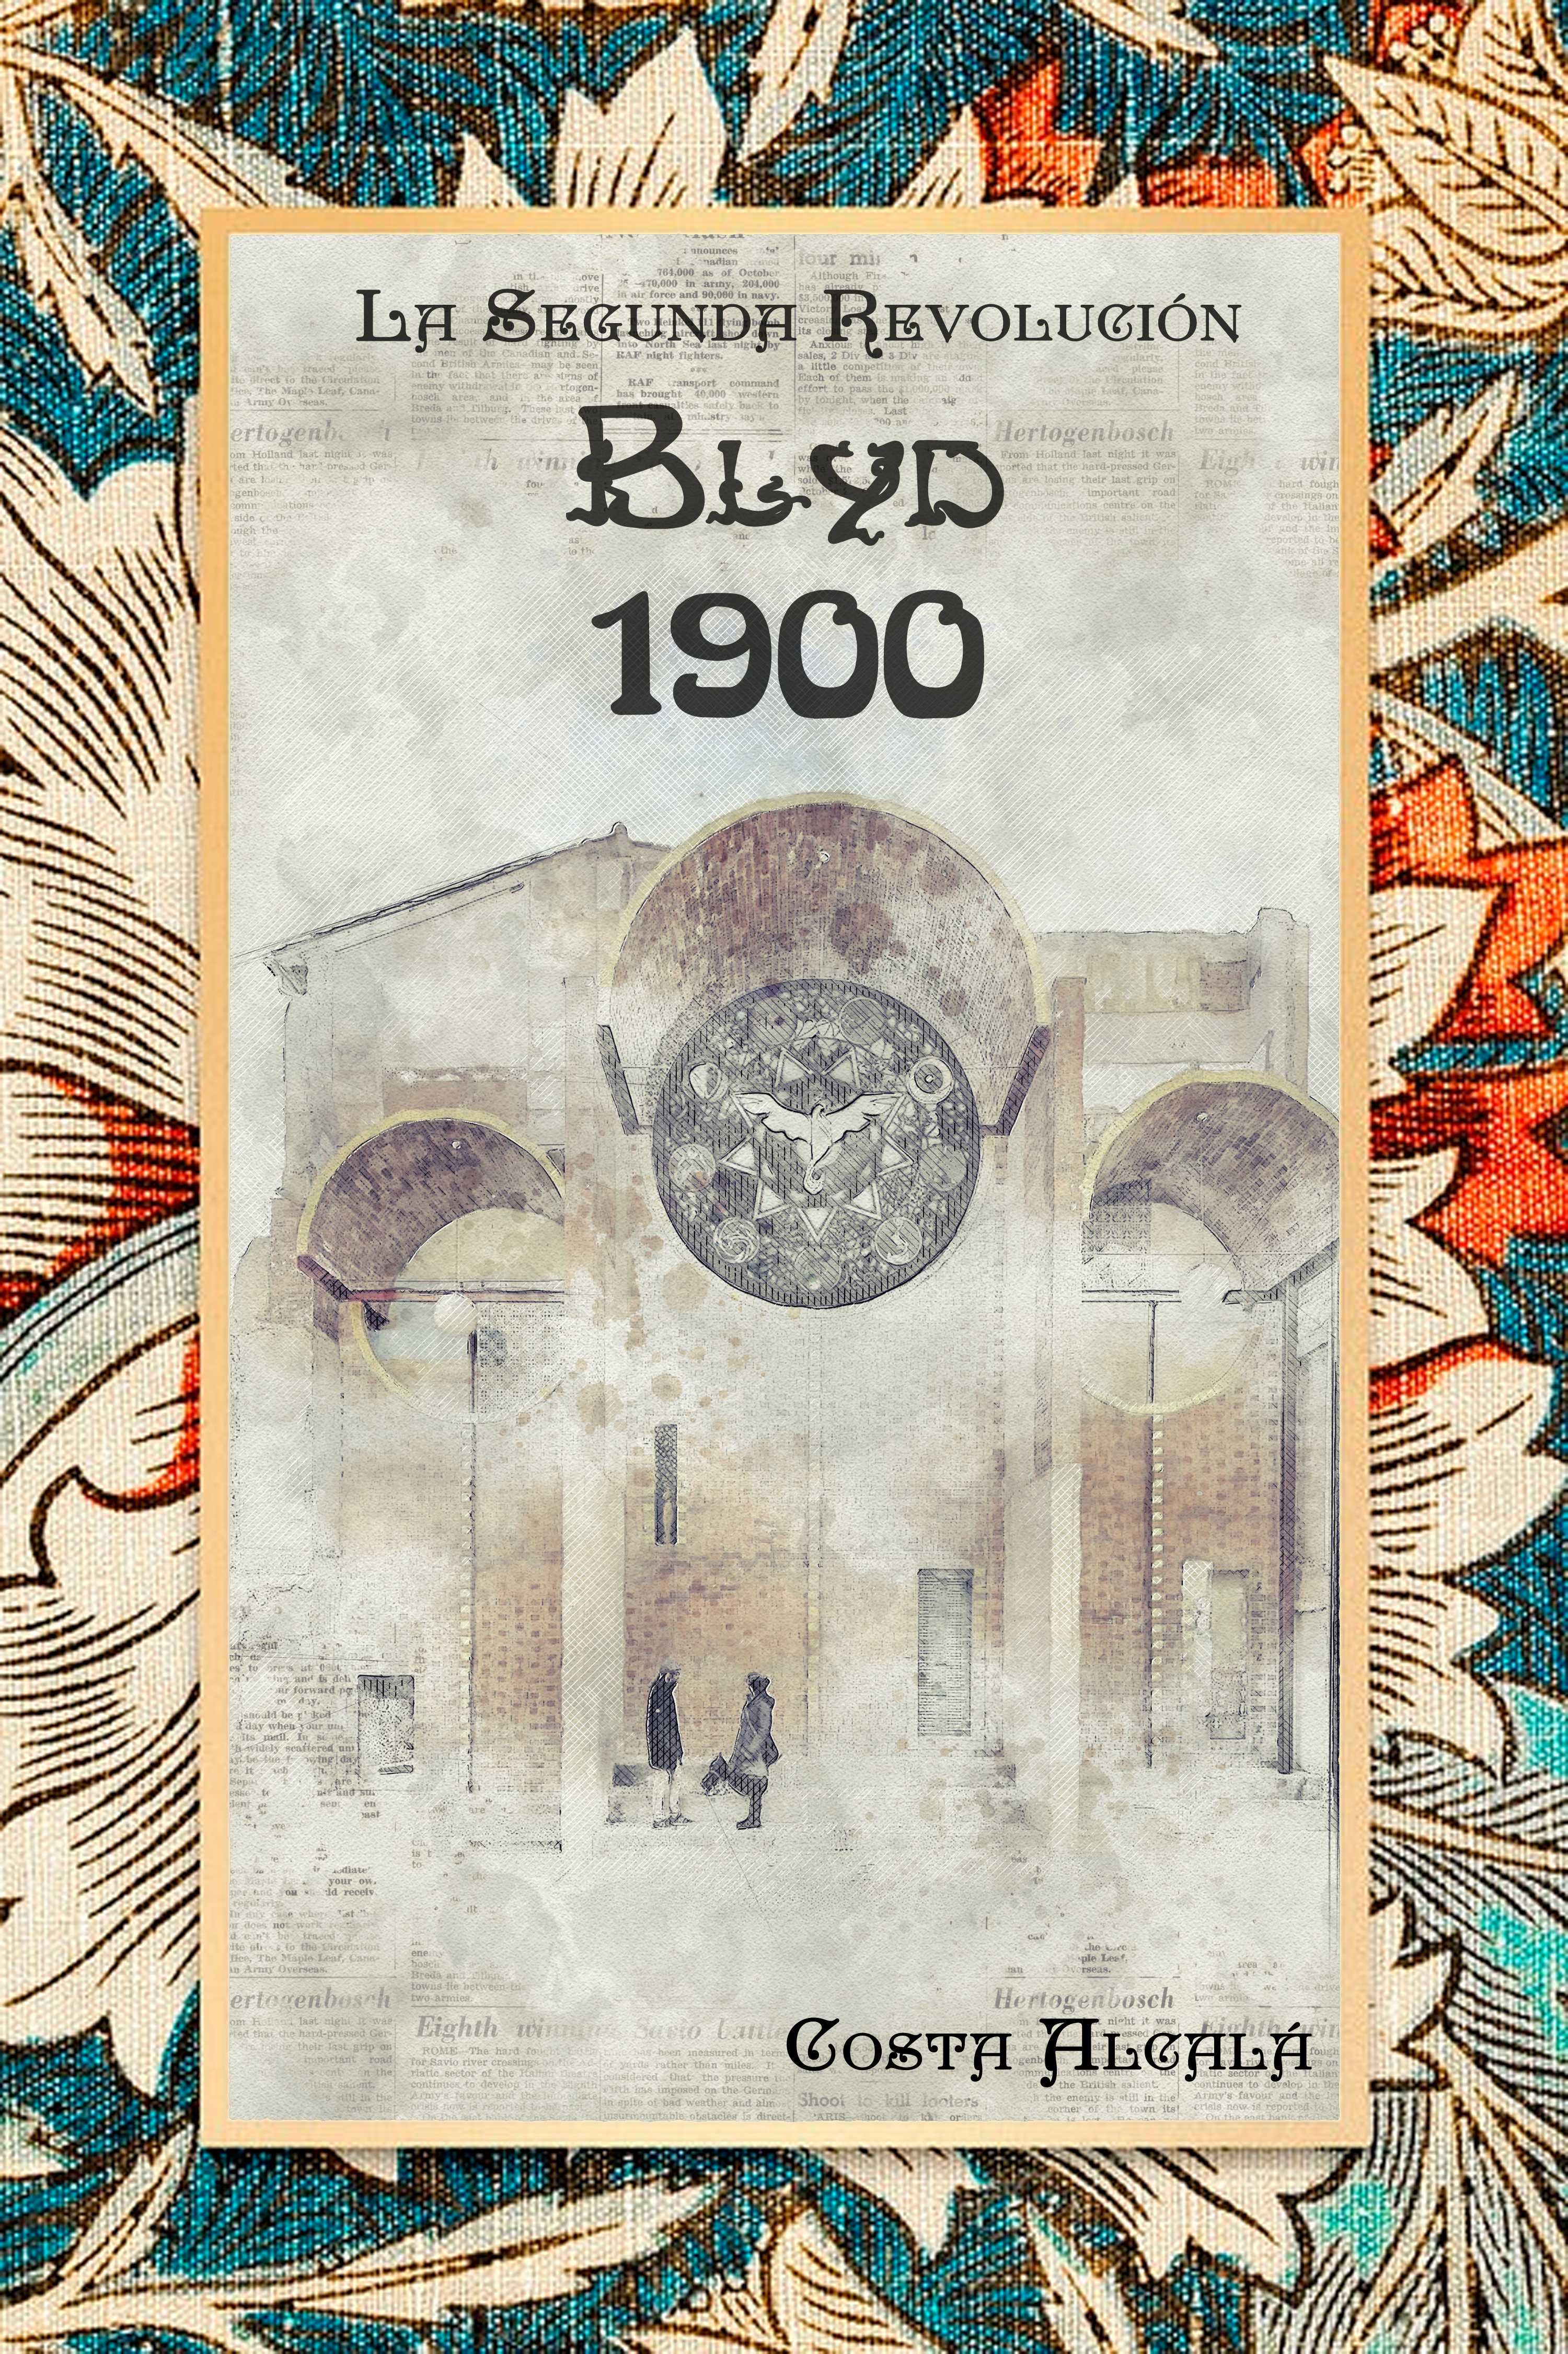 portada prueba blyd 1900